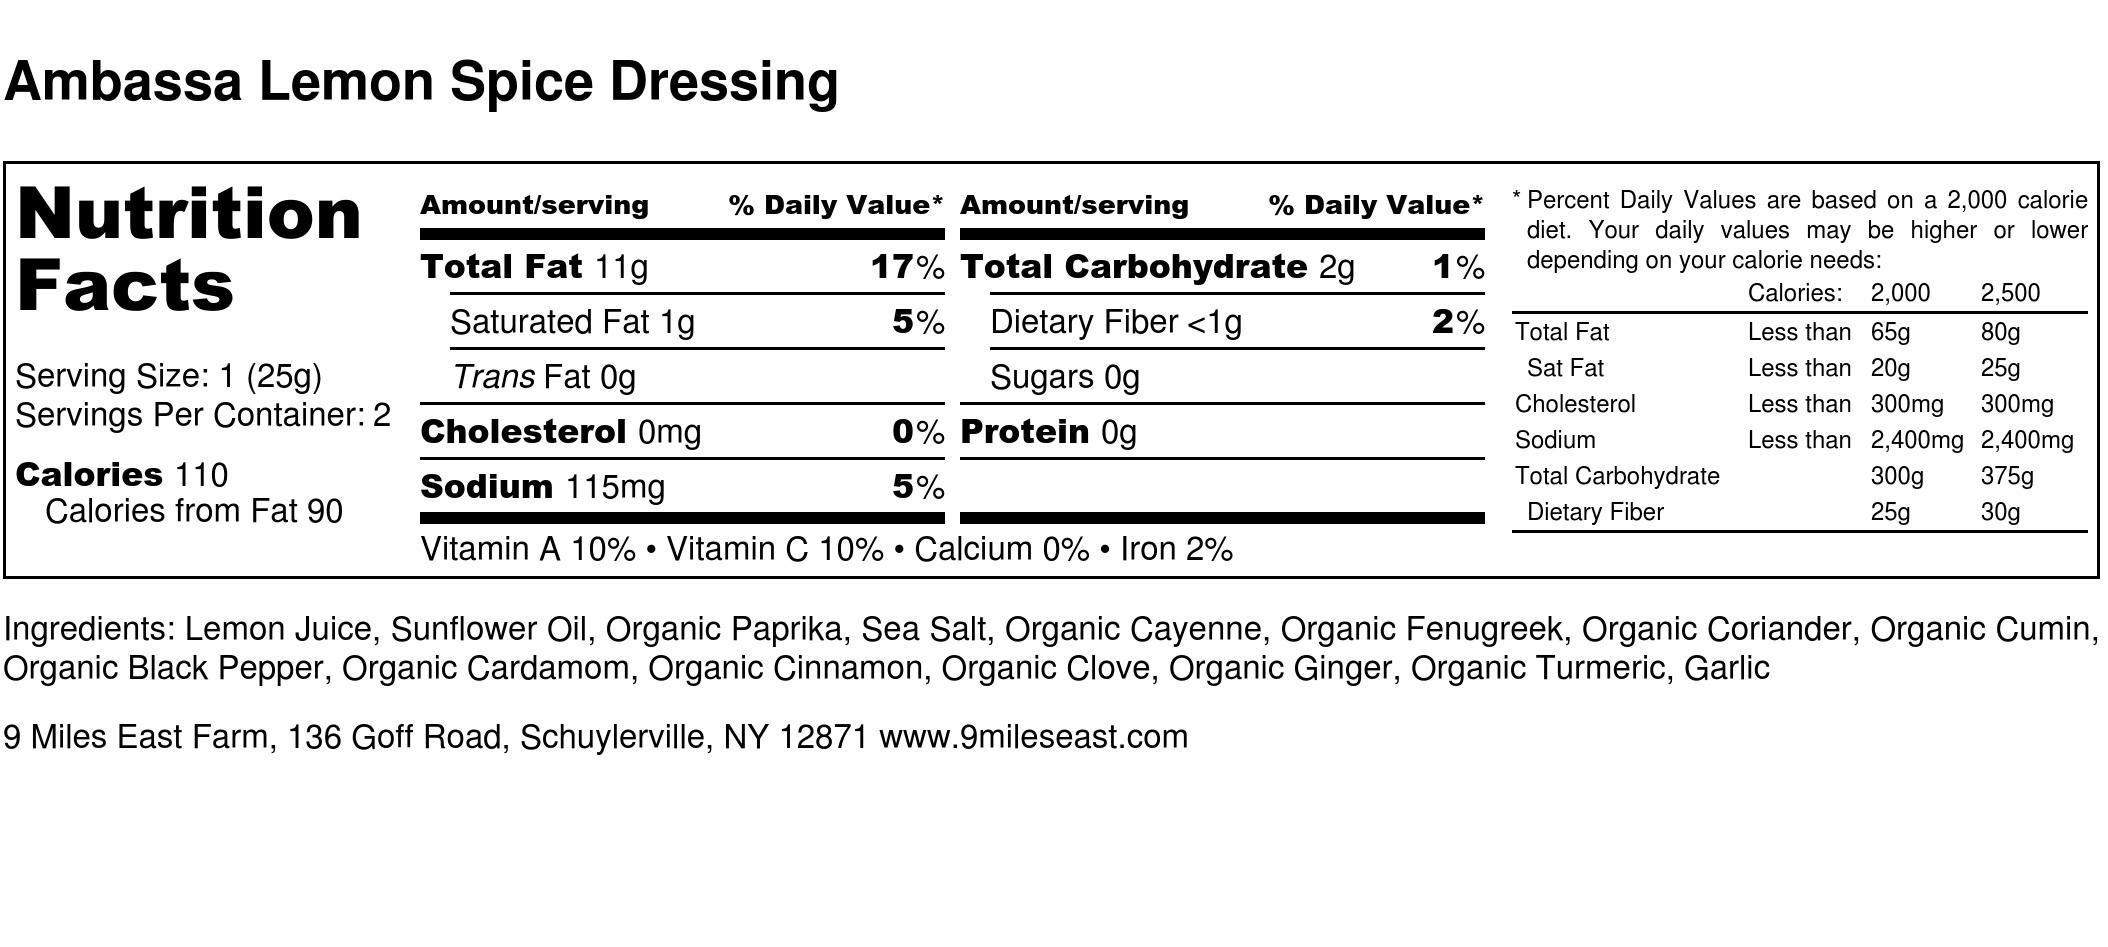 Ambassa Lemon Spice Dressing - Nutrition Label.jpg